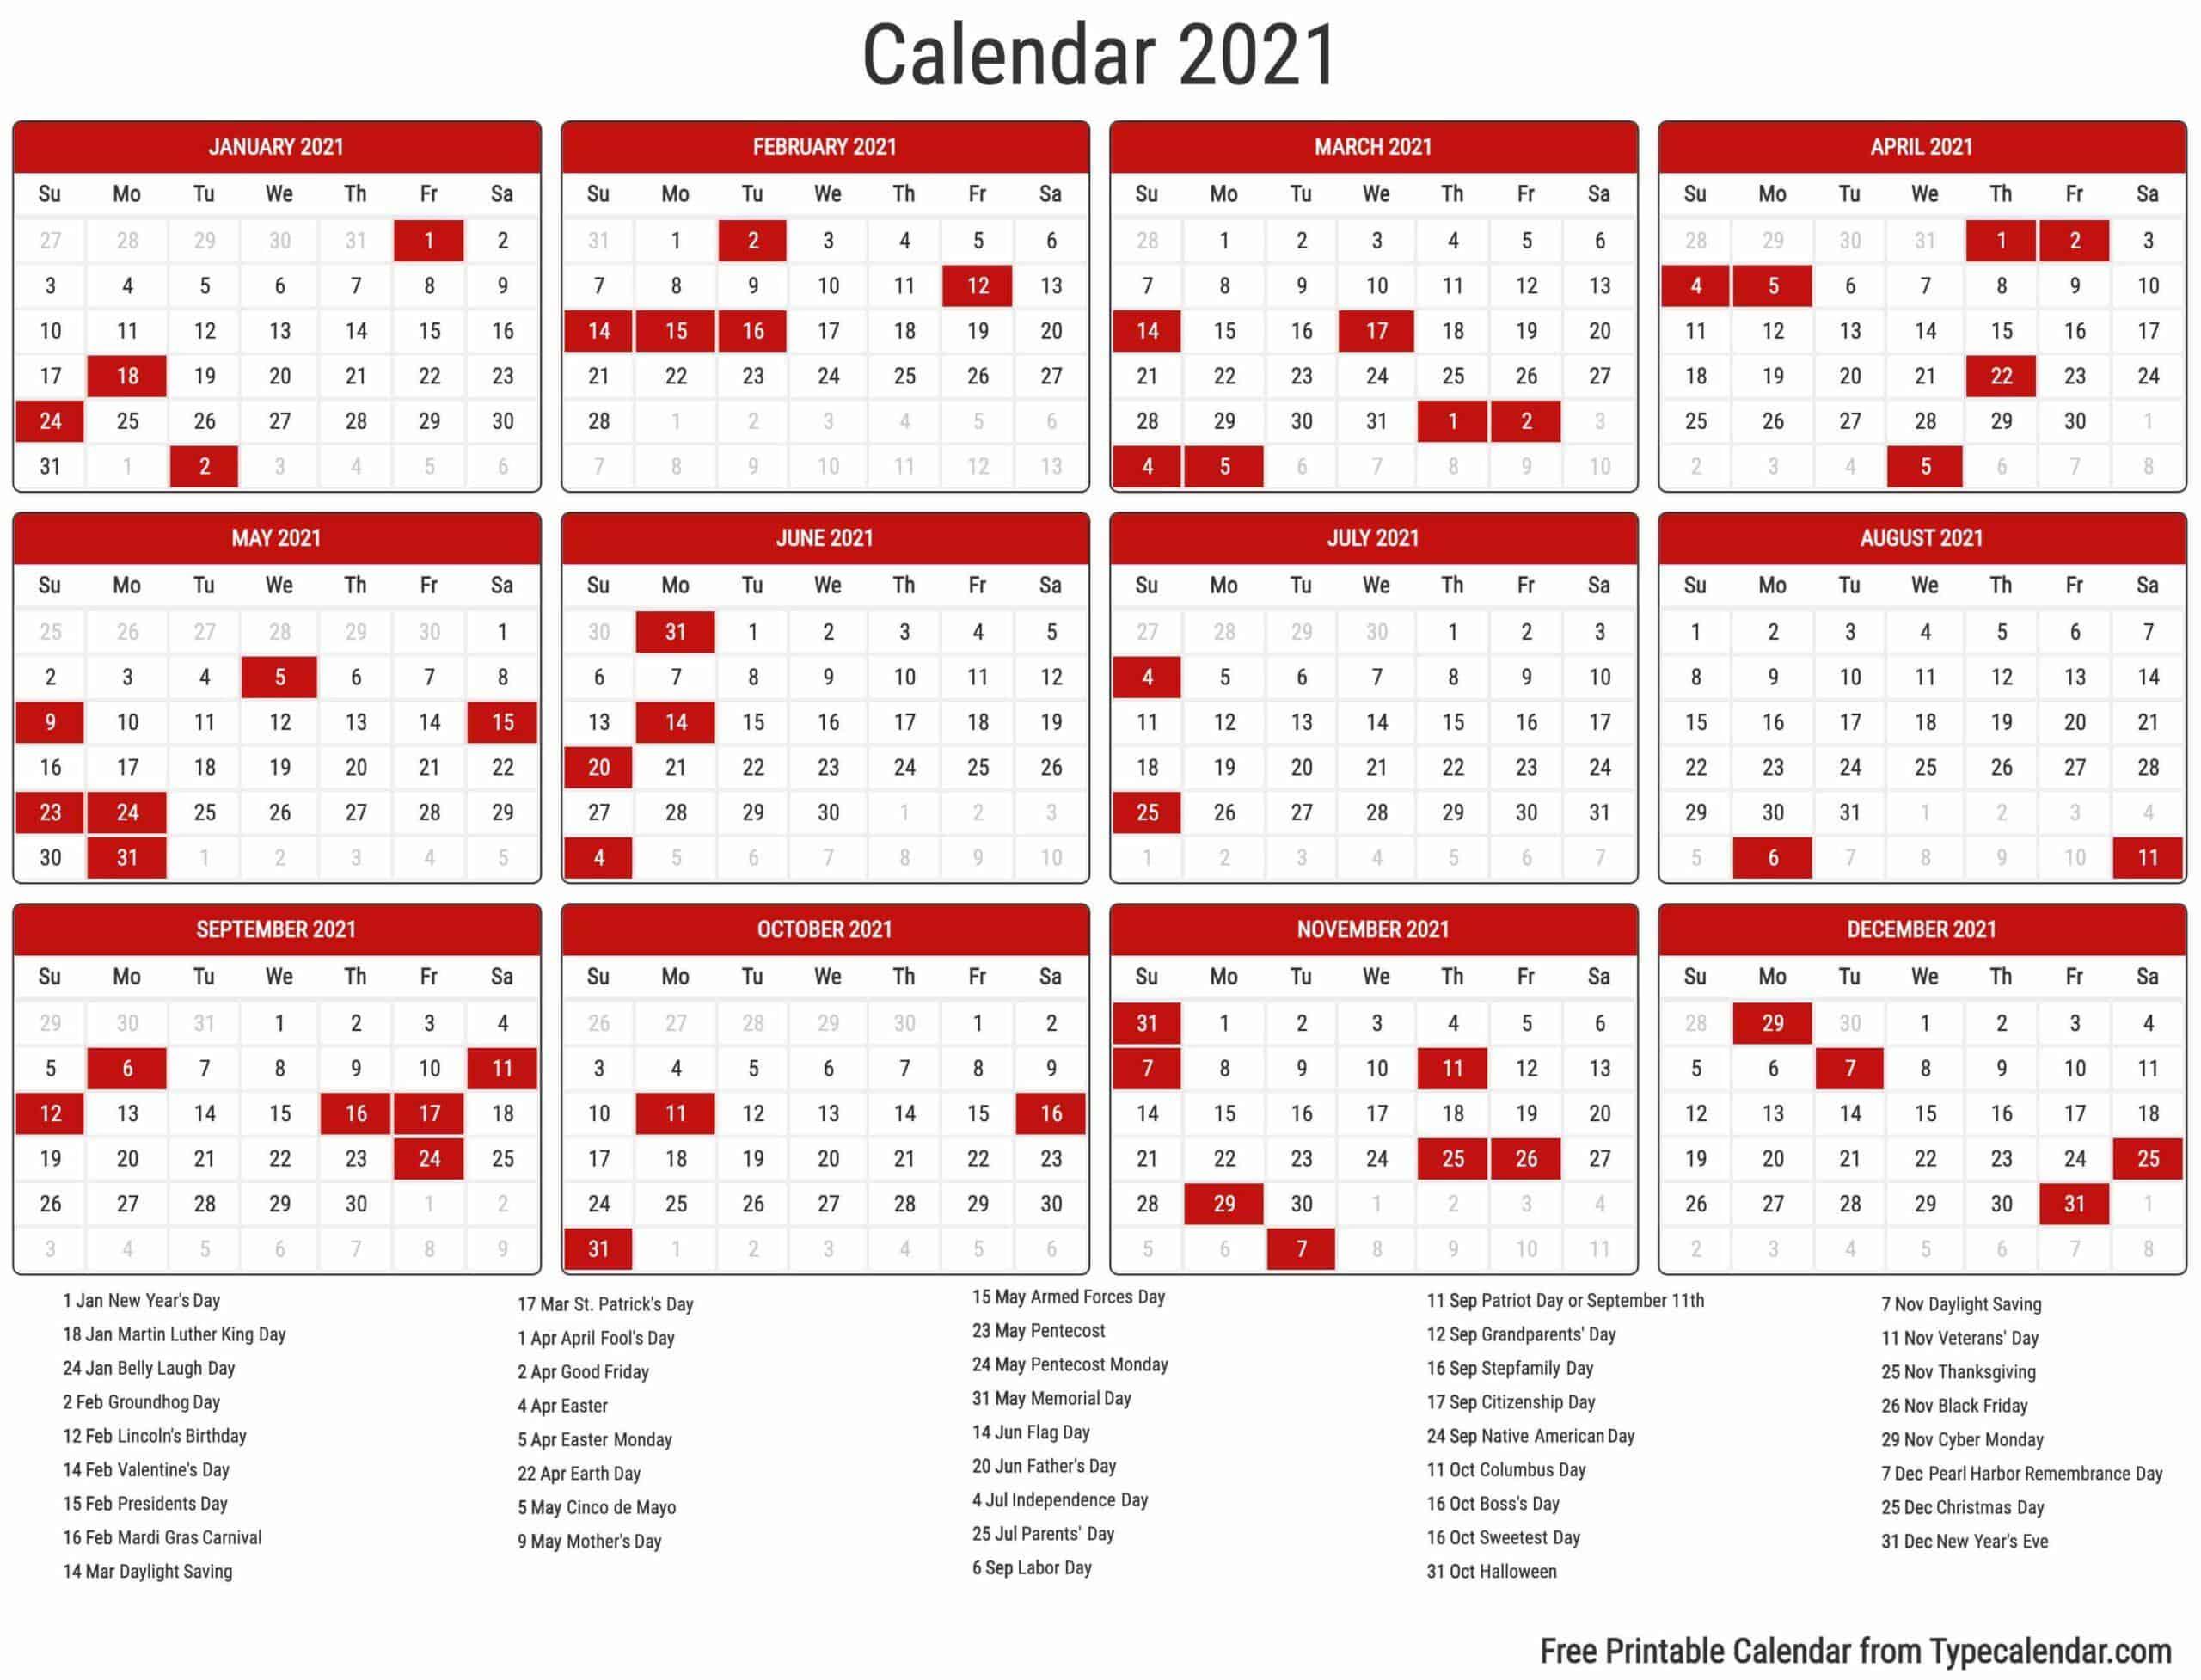 Free Printable Year 20 Calendar   Type Calendar